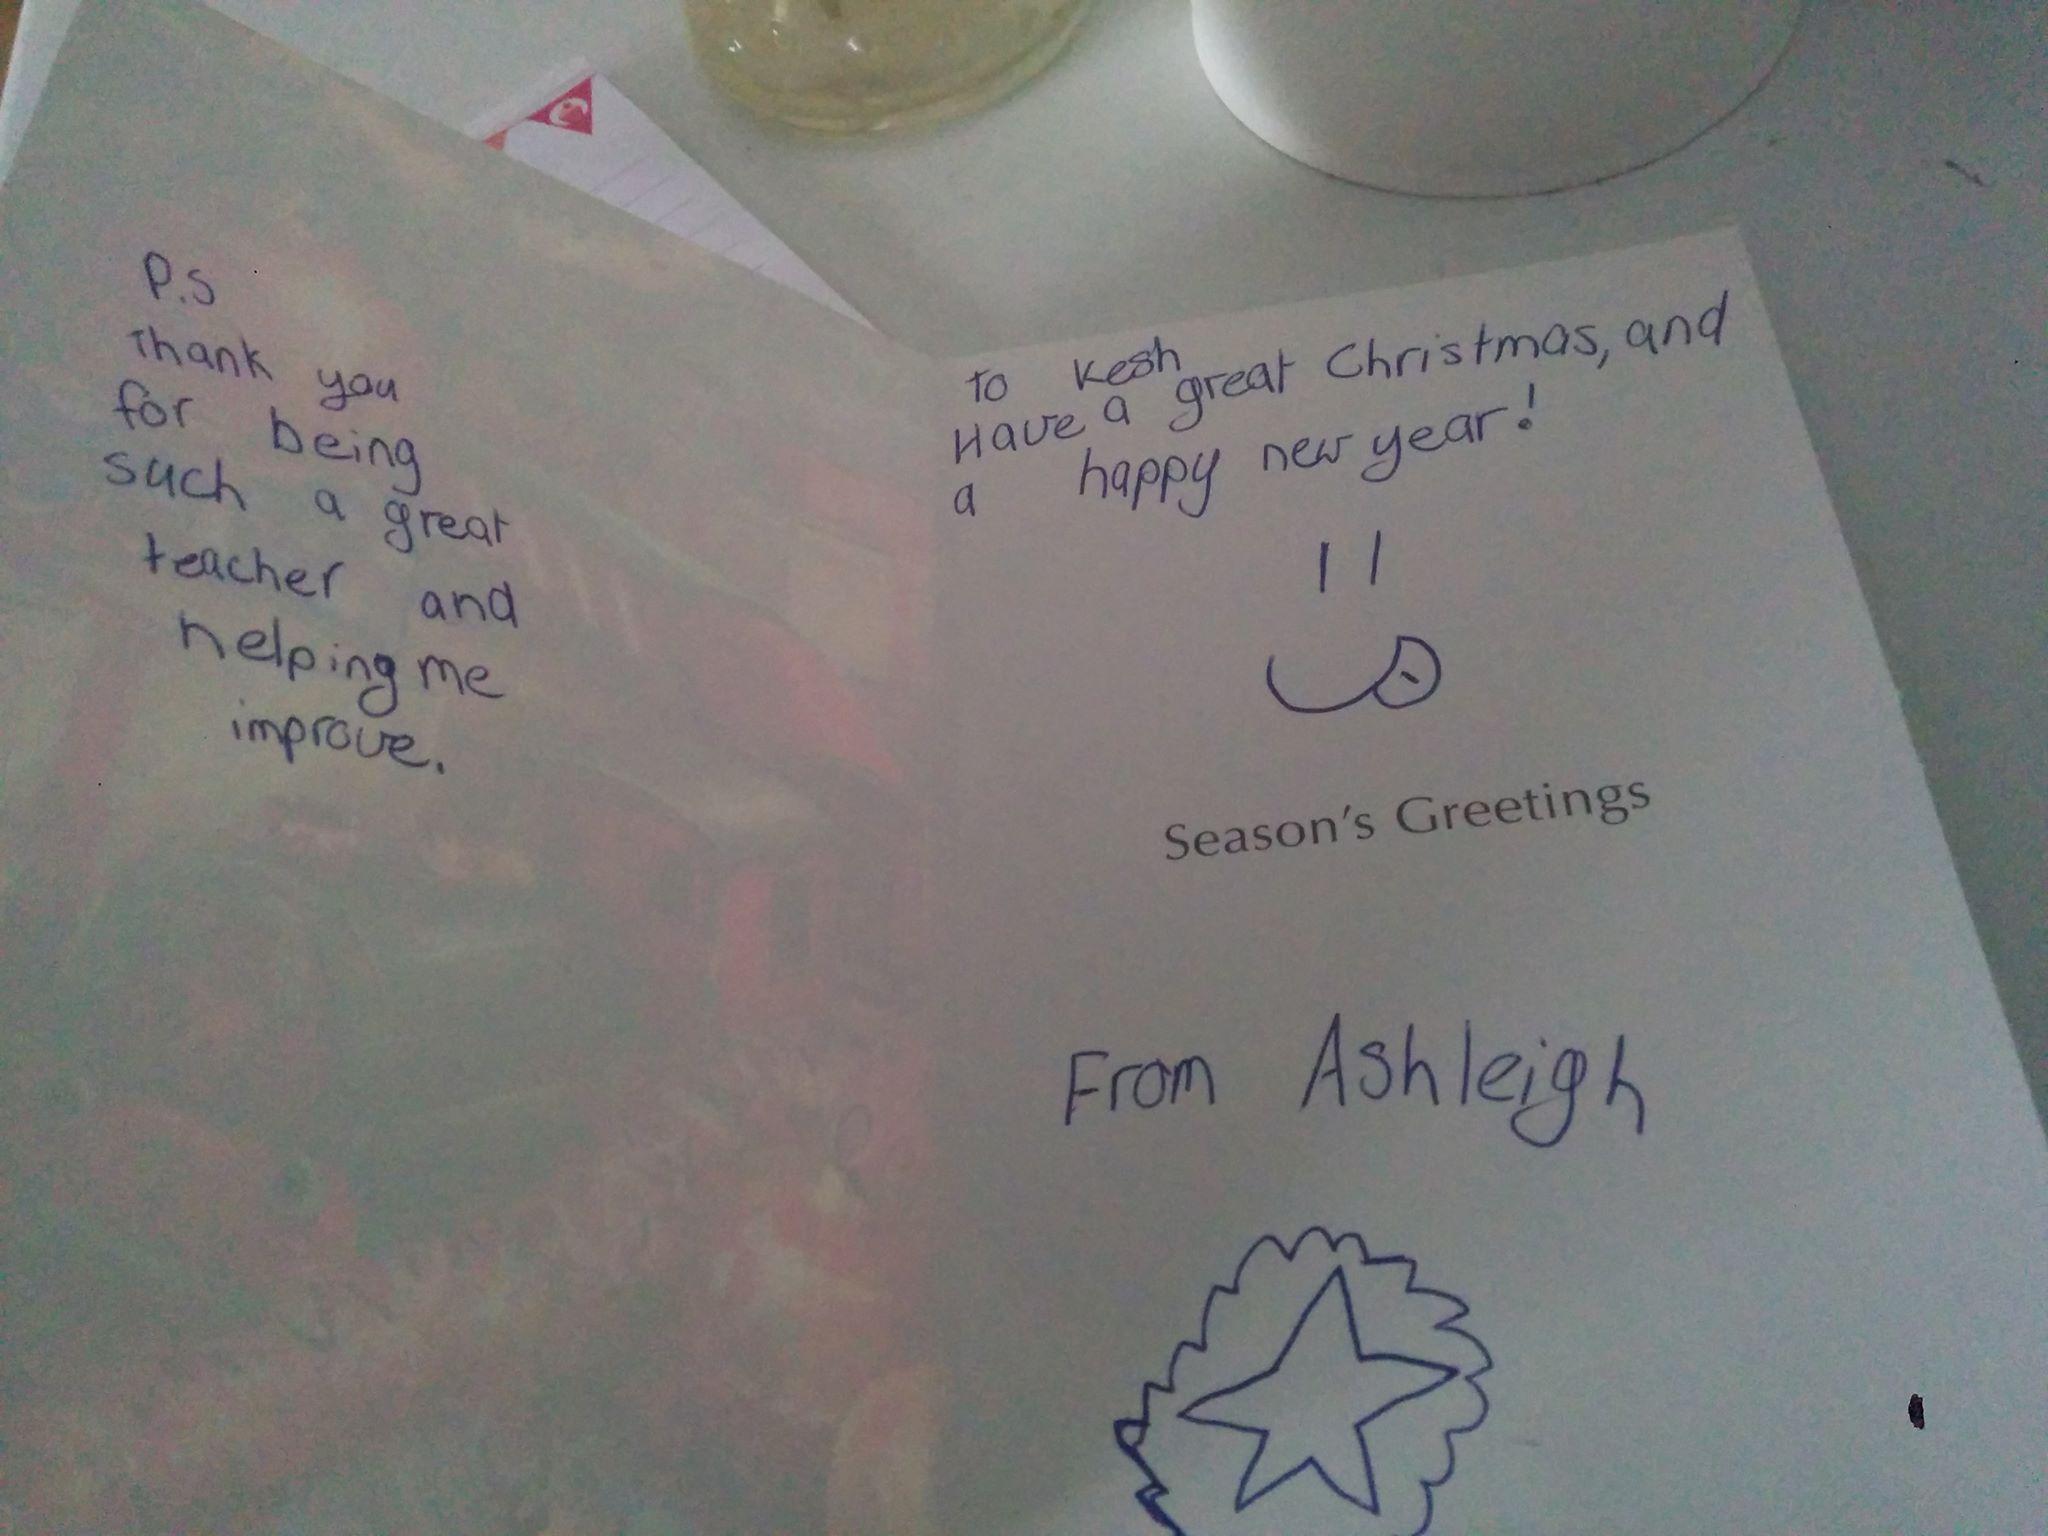 A 'Thank You' card